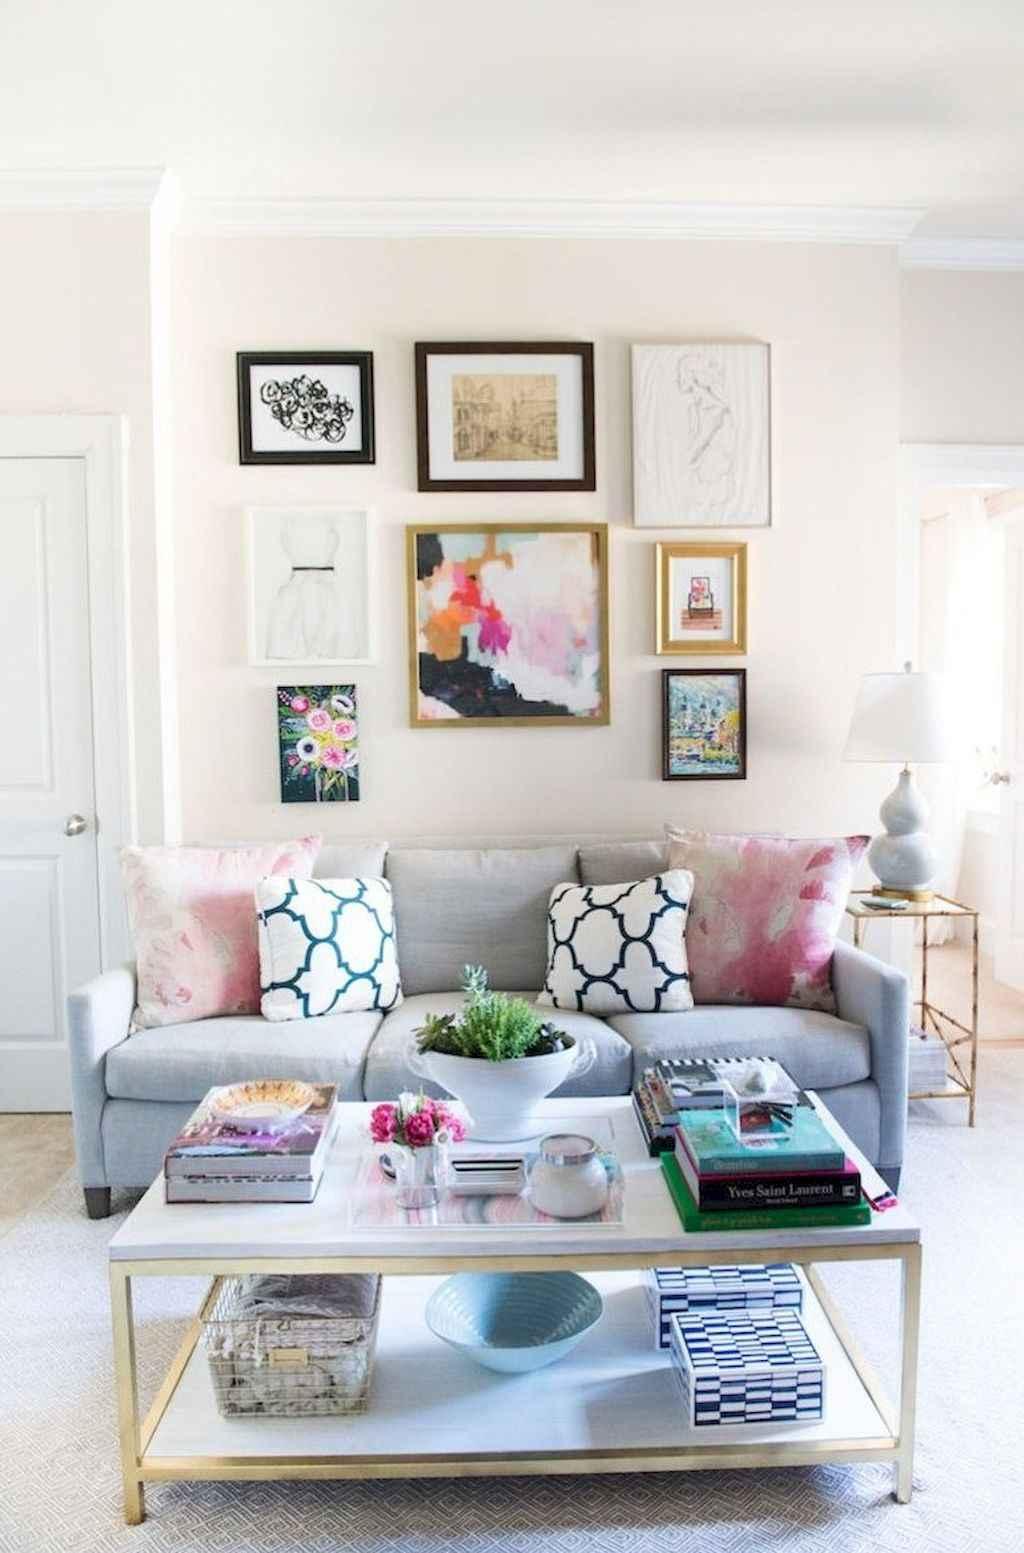 Small apartment decorating ideas (14)